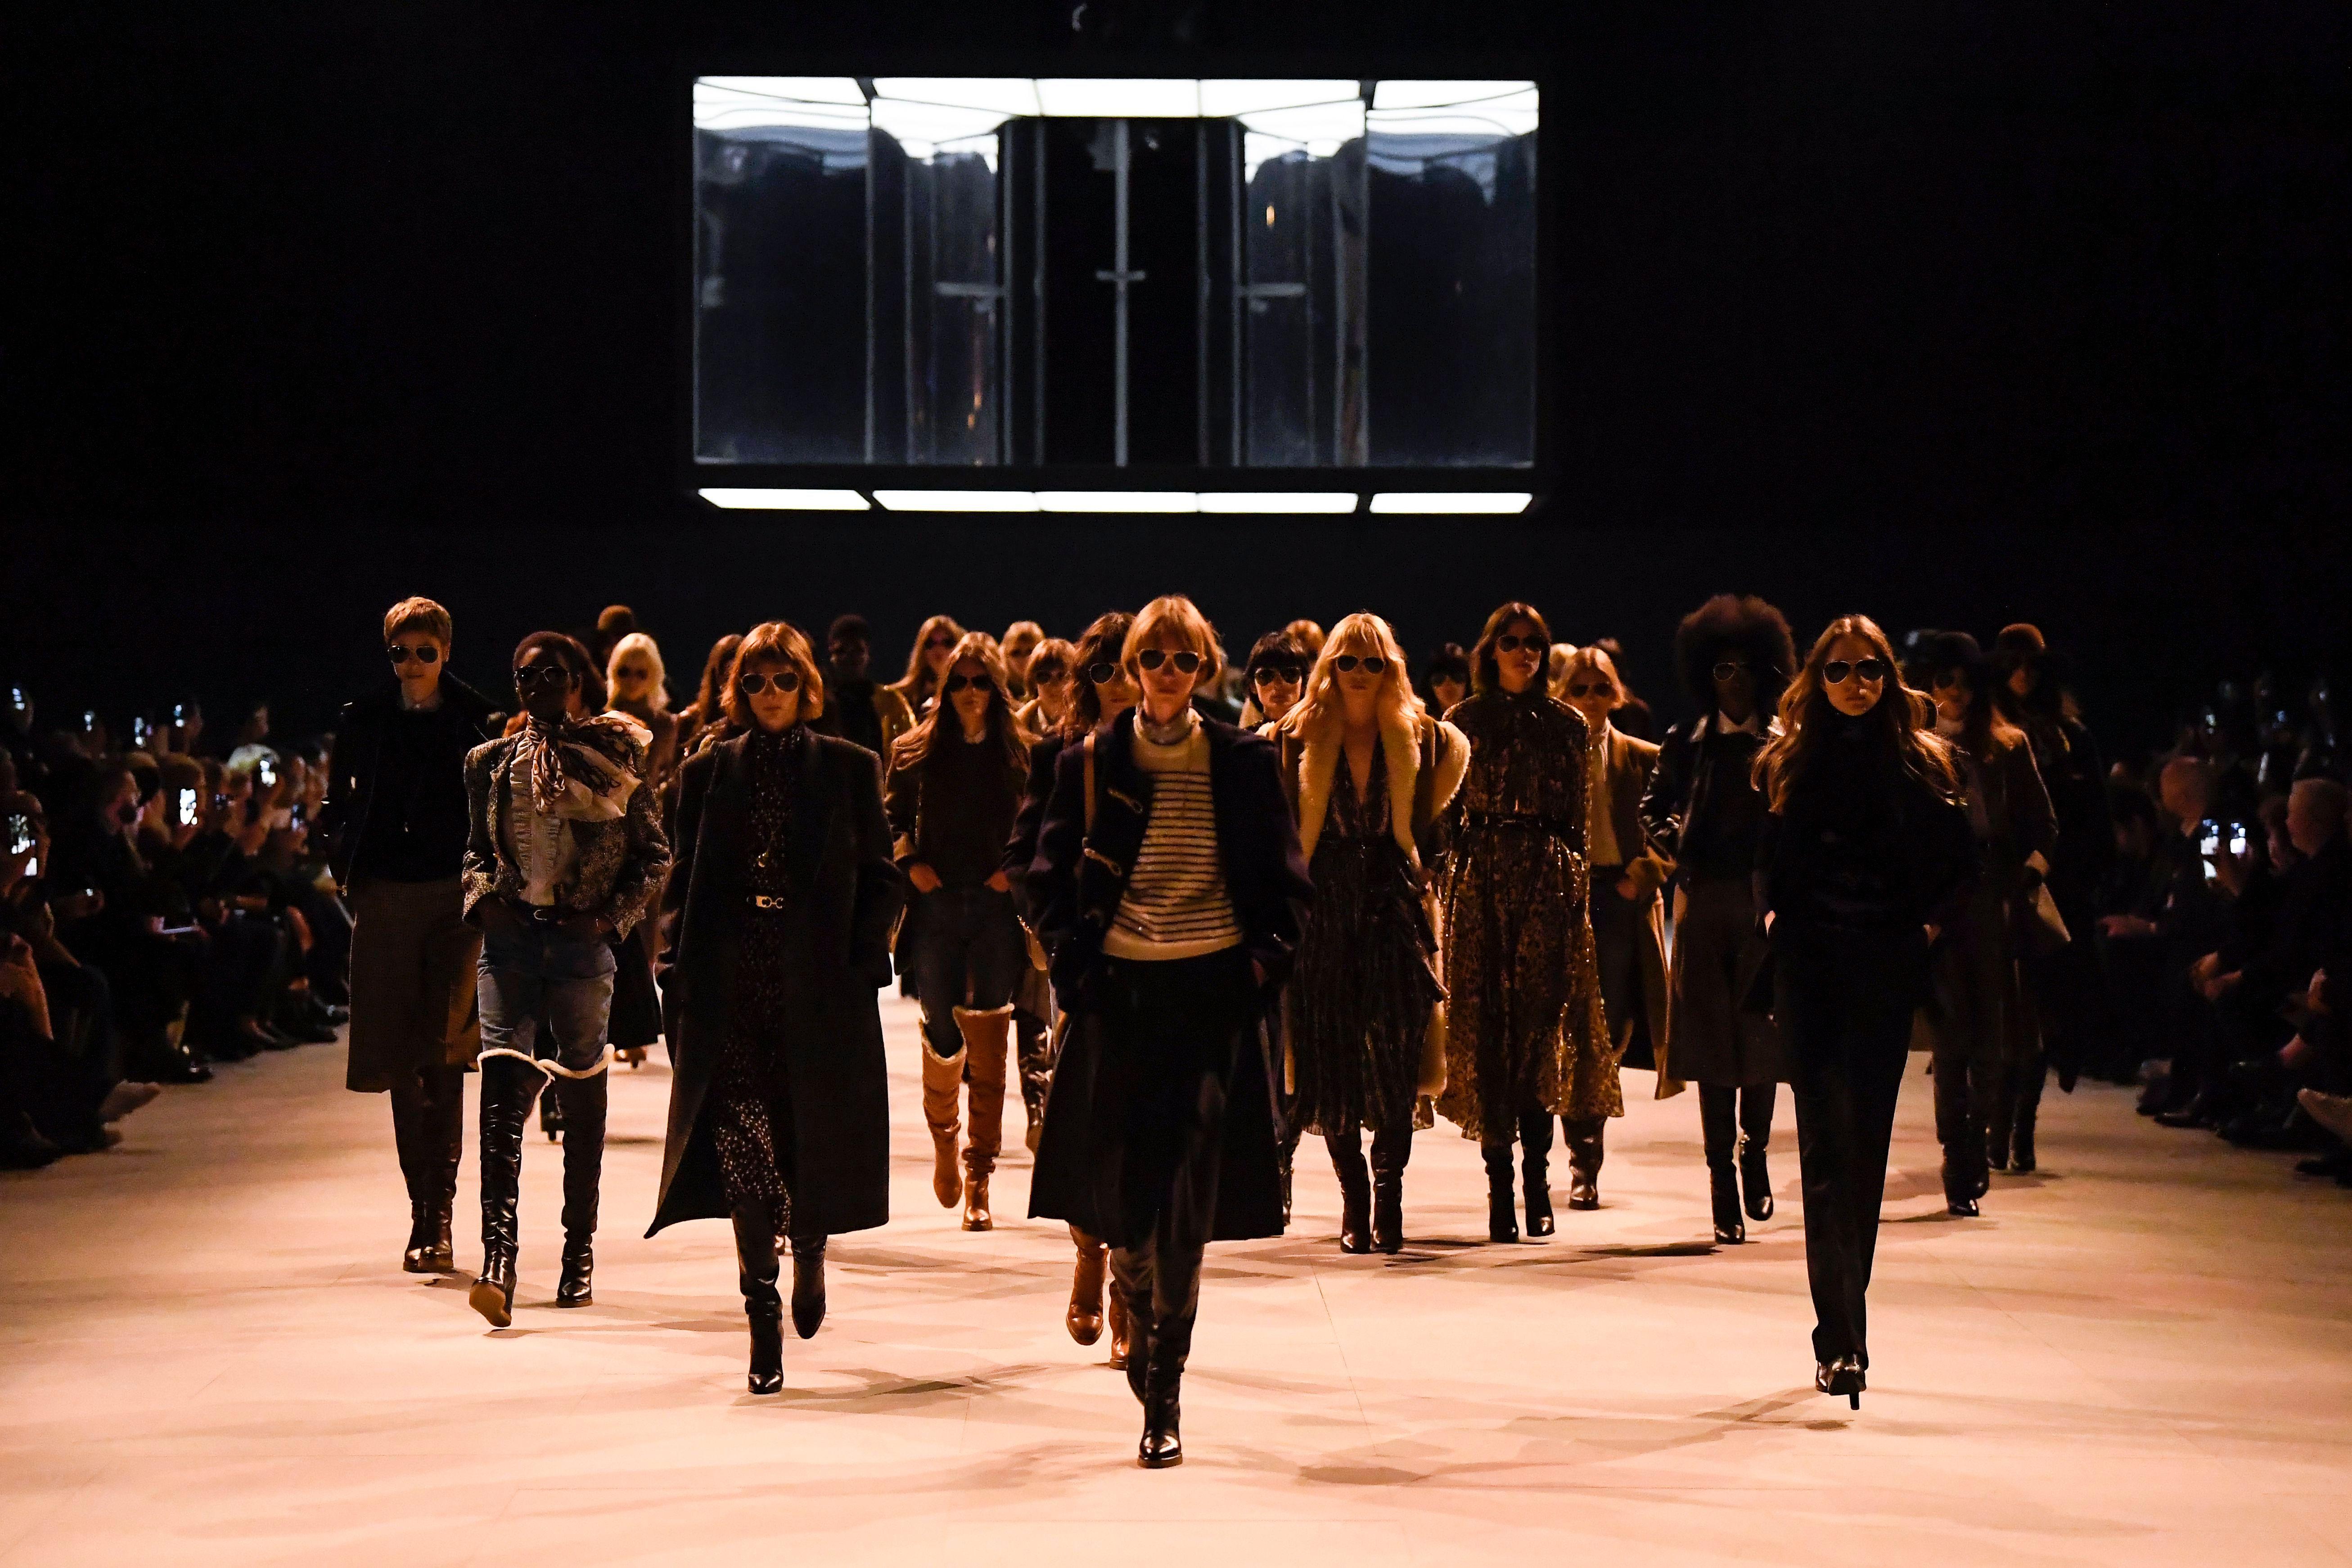 Models on the catwalkCeline show, Runway, Fall Winter 2019, Paris Fashion Week, France - 01 Mar 2019